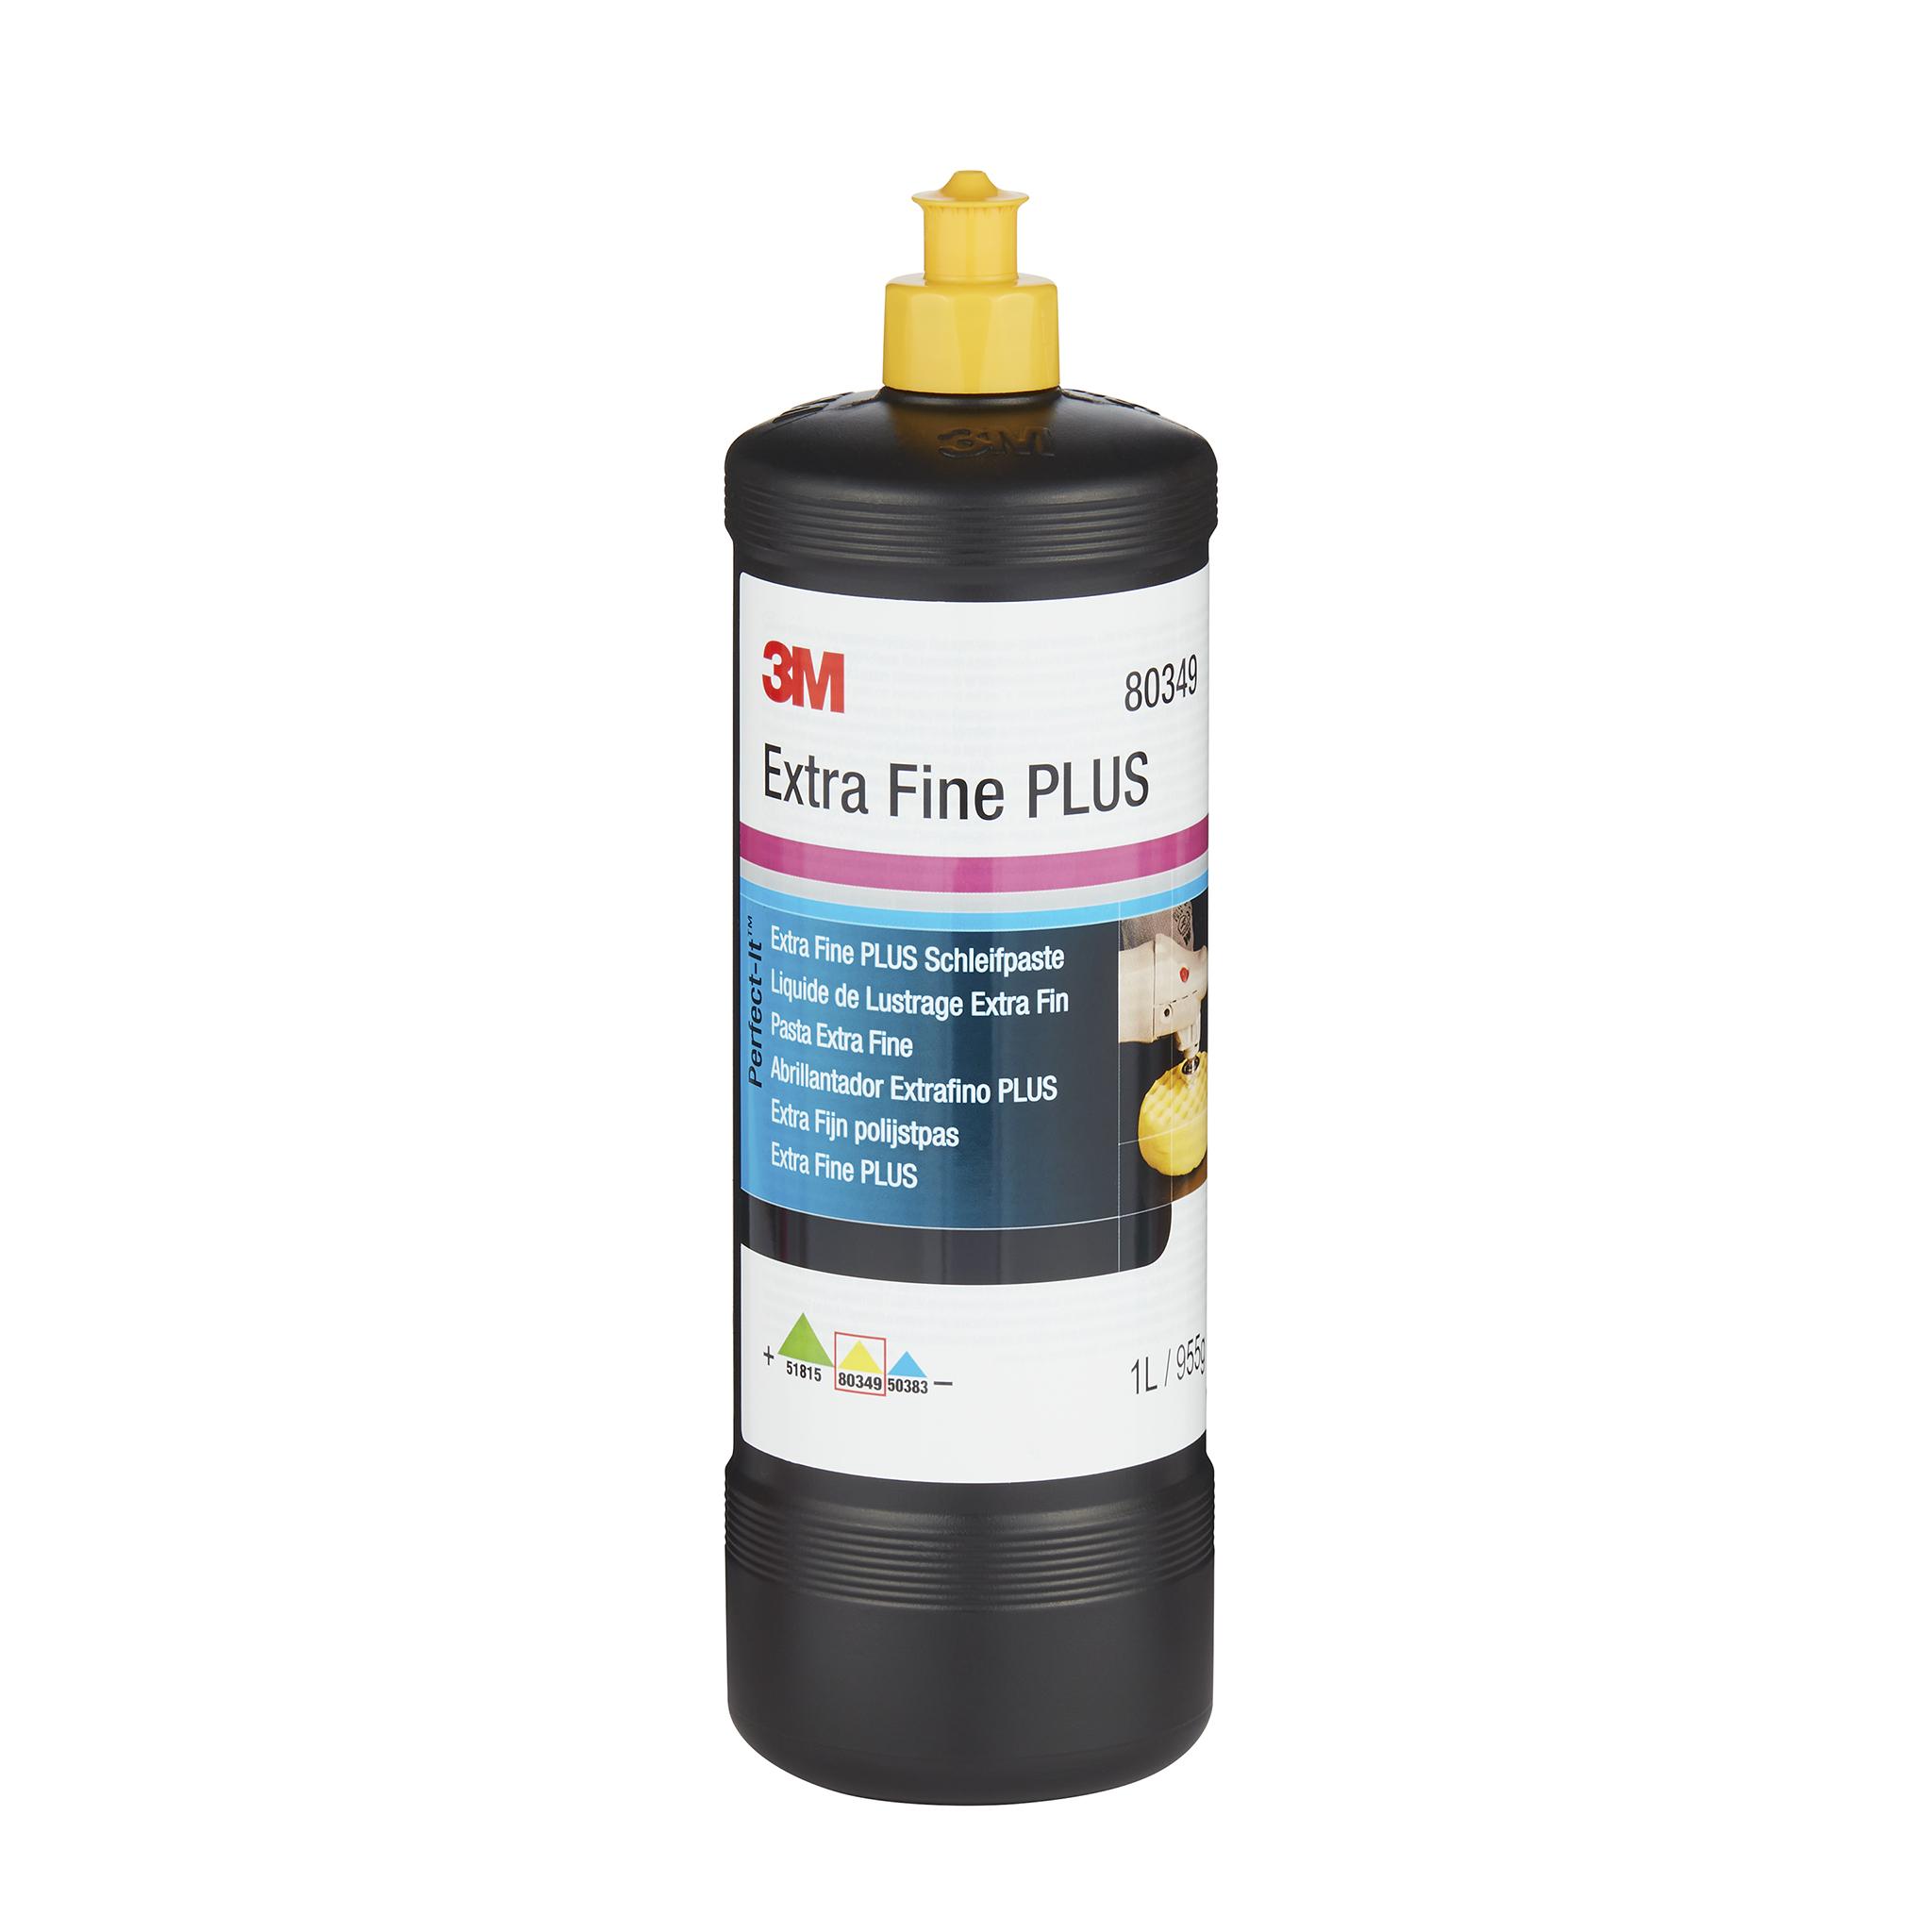 Polermedel 3M Gul kork Extra Fine Plus, Rubbing / Polishing, 1000 g